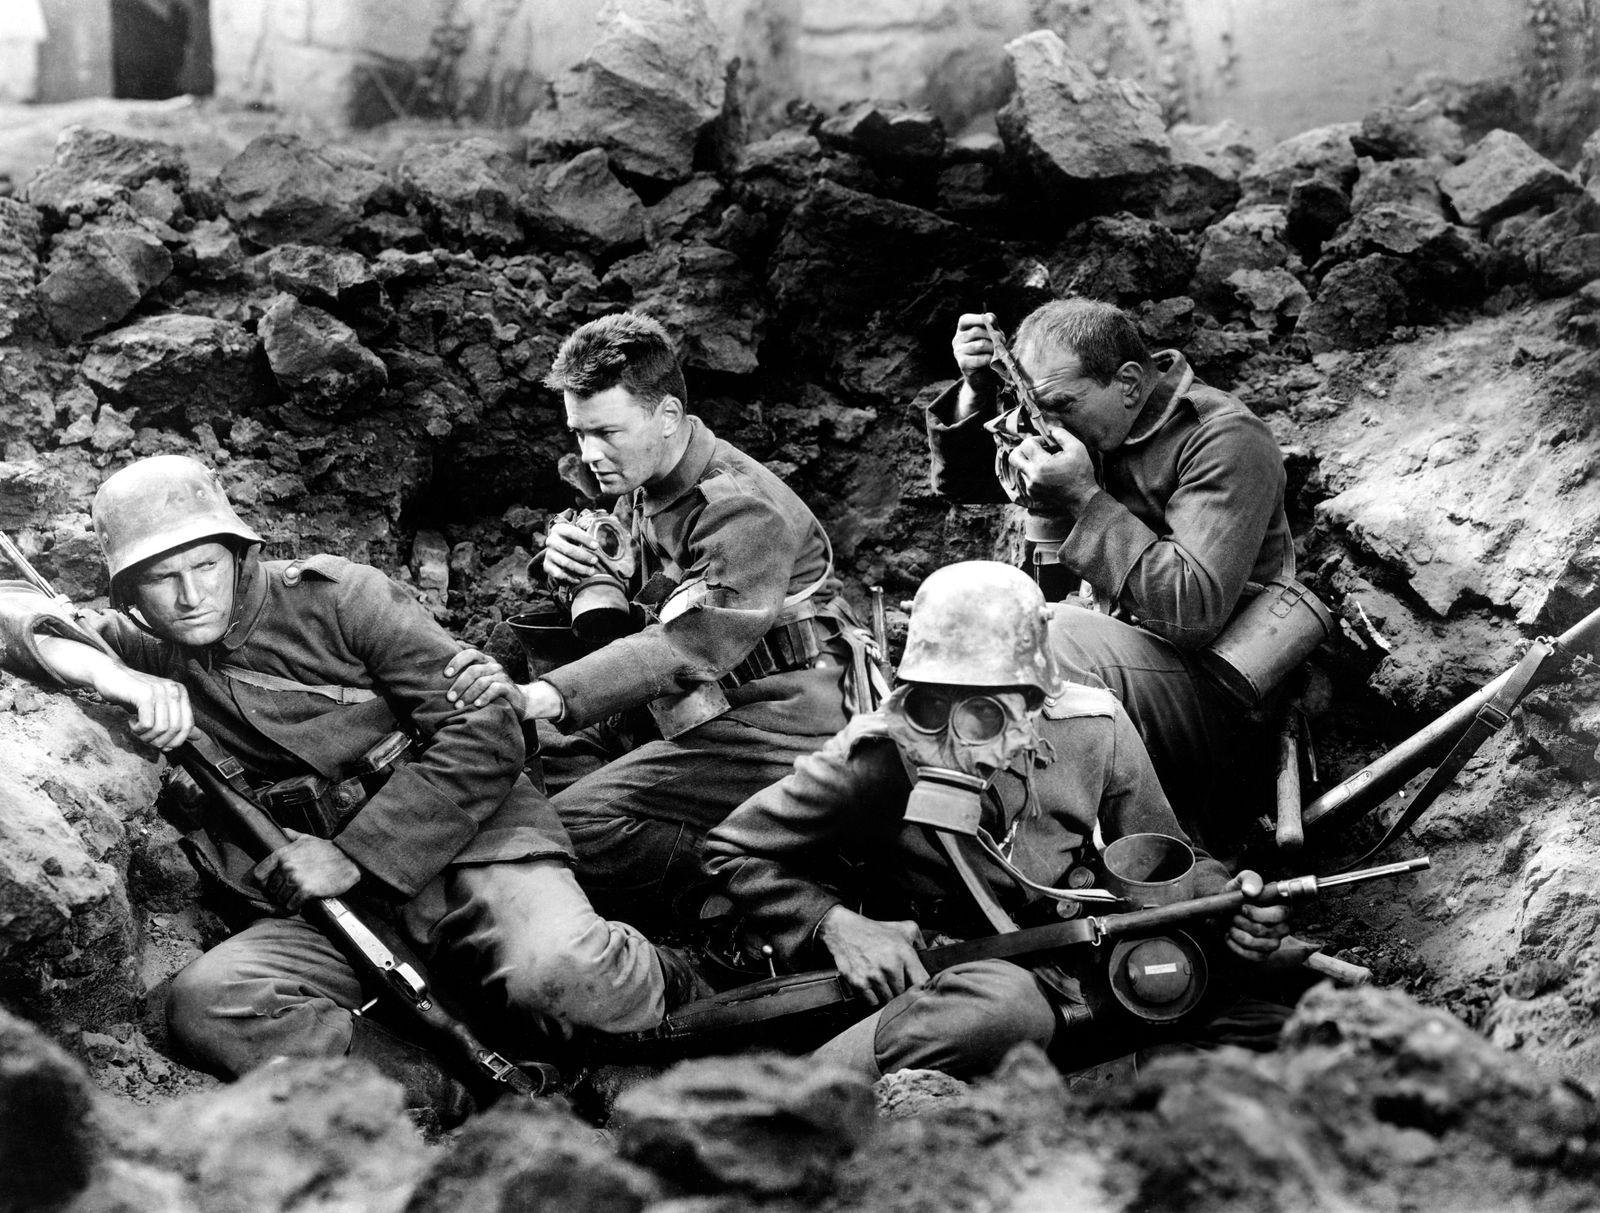 ALL QUIET ON THE WESTERN FRONT, Ben Alexander, Lew Ayres, Louis Wolheim, 1930